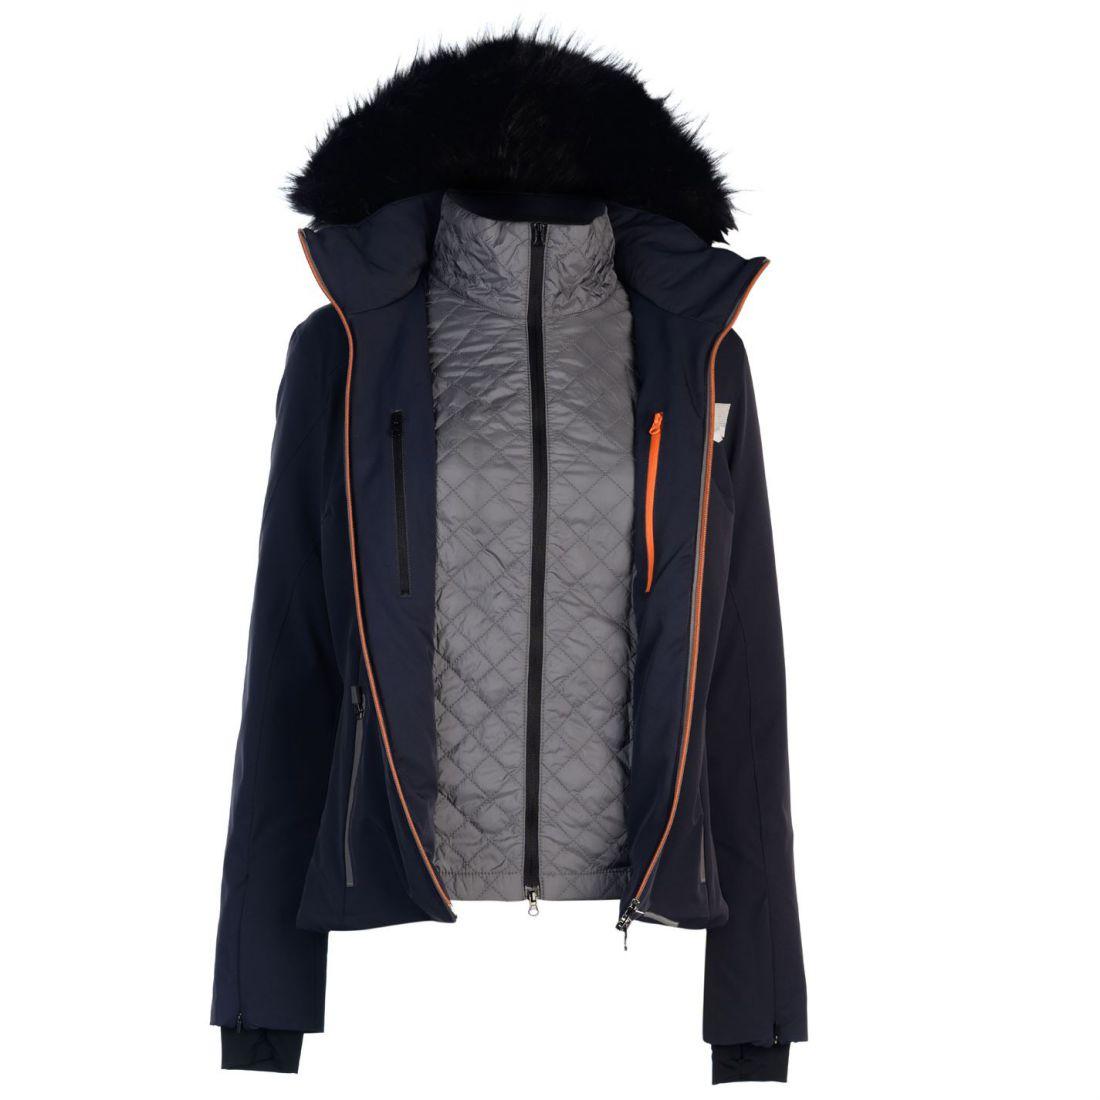 Image is loading Colmar-Womens-Ecostretch-Ski-Jacket-Coat-Top-Waterproof- 526ef6846